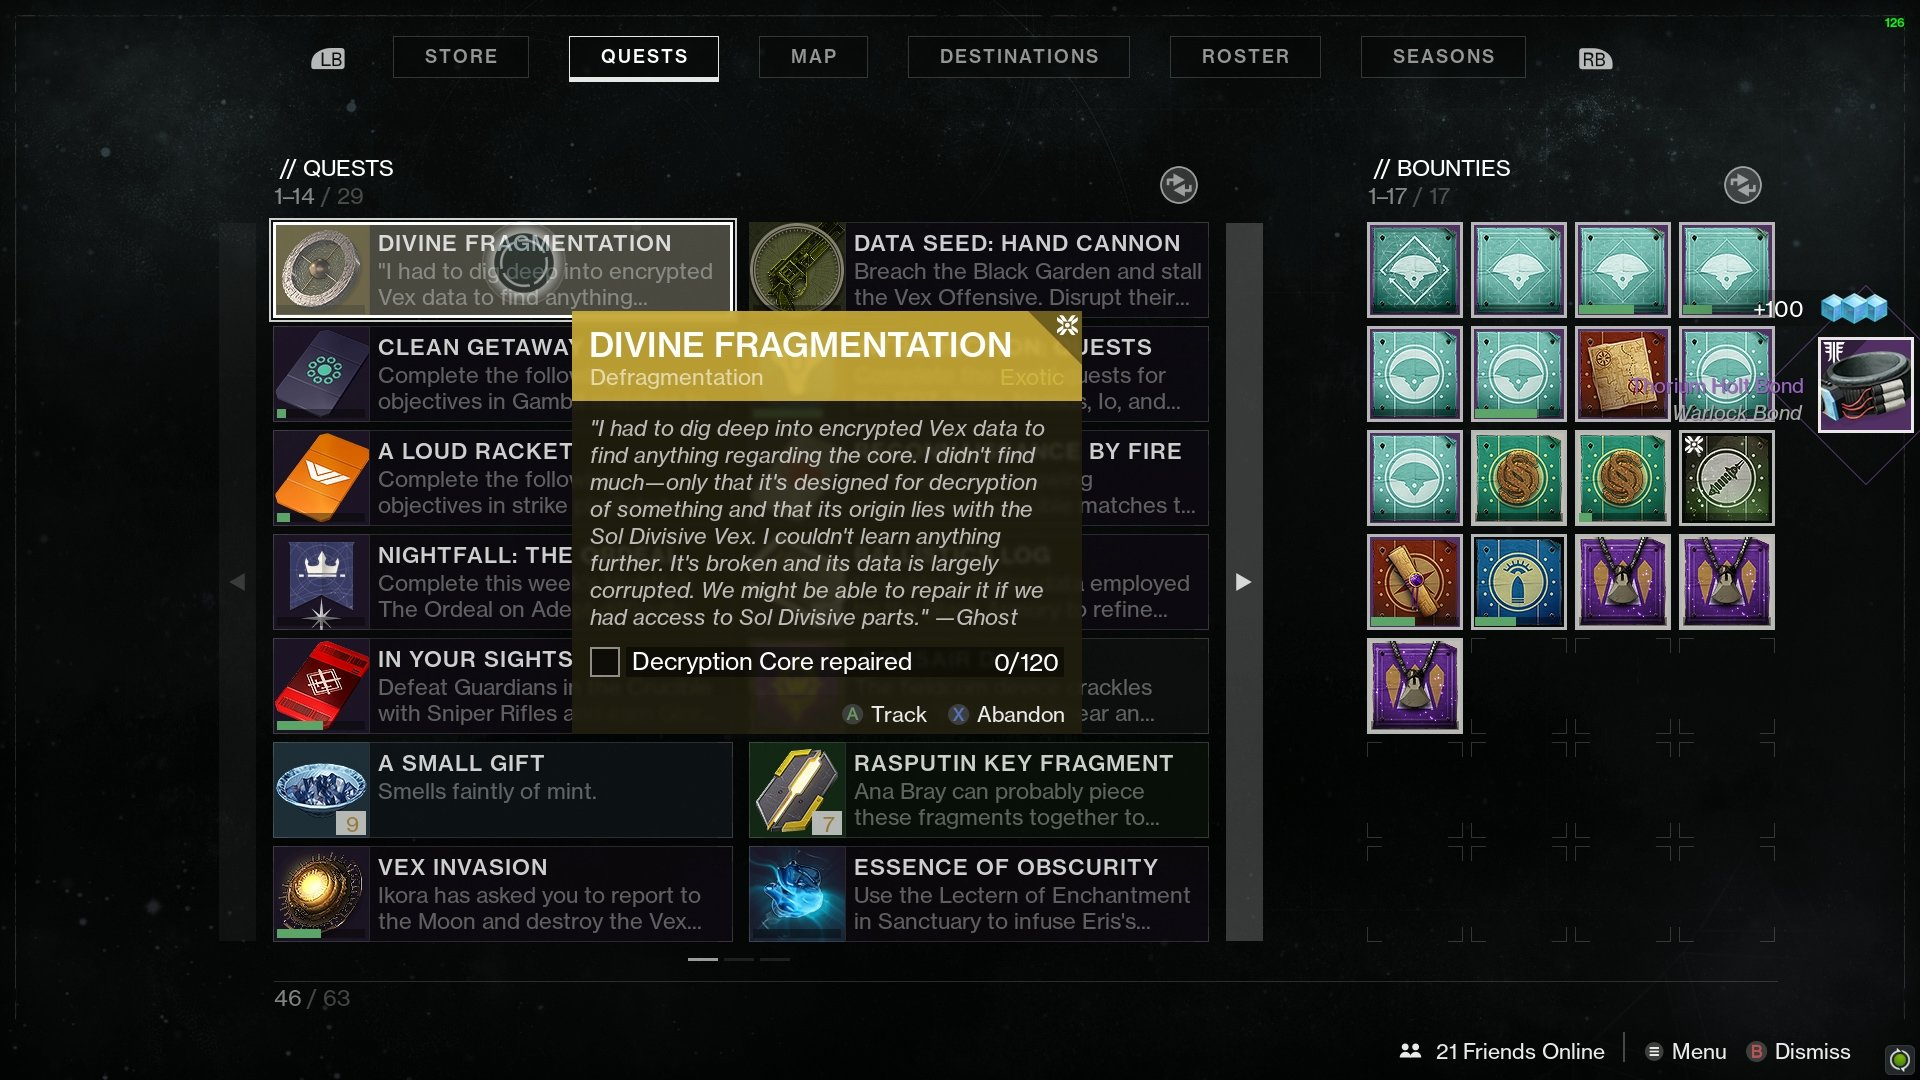 Defragmentation repair core Destiny 2